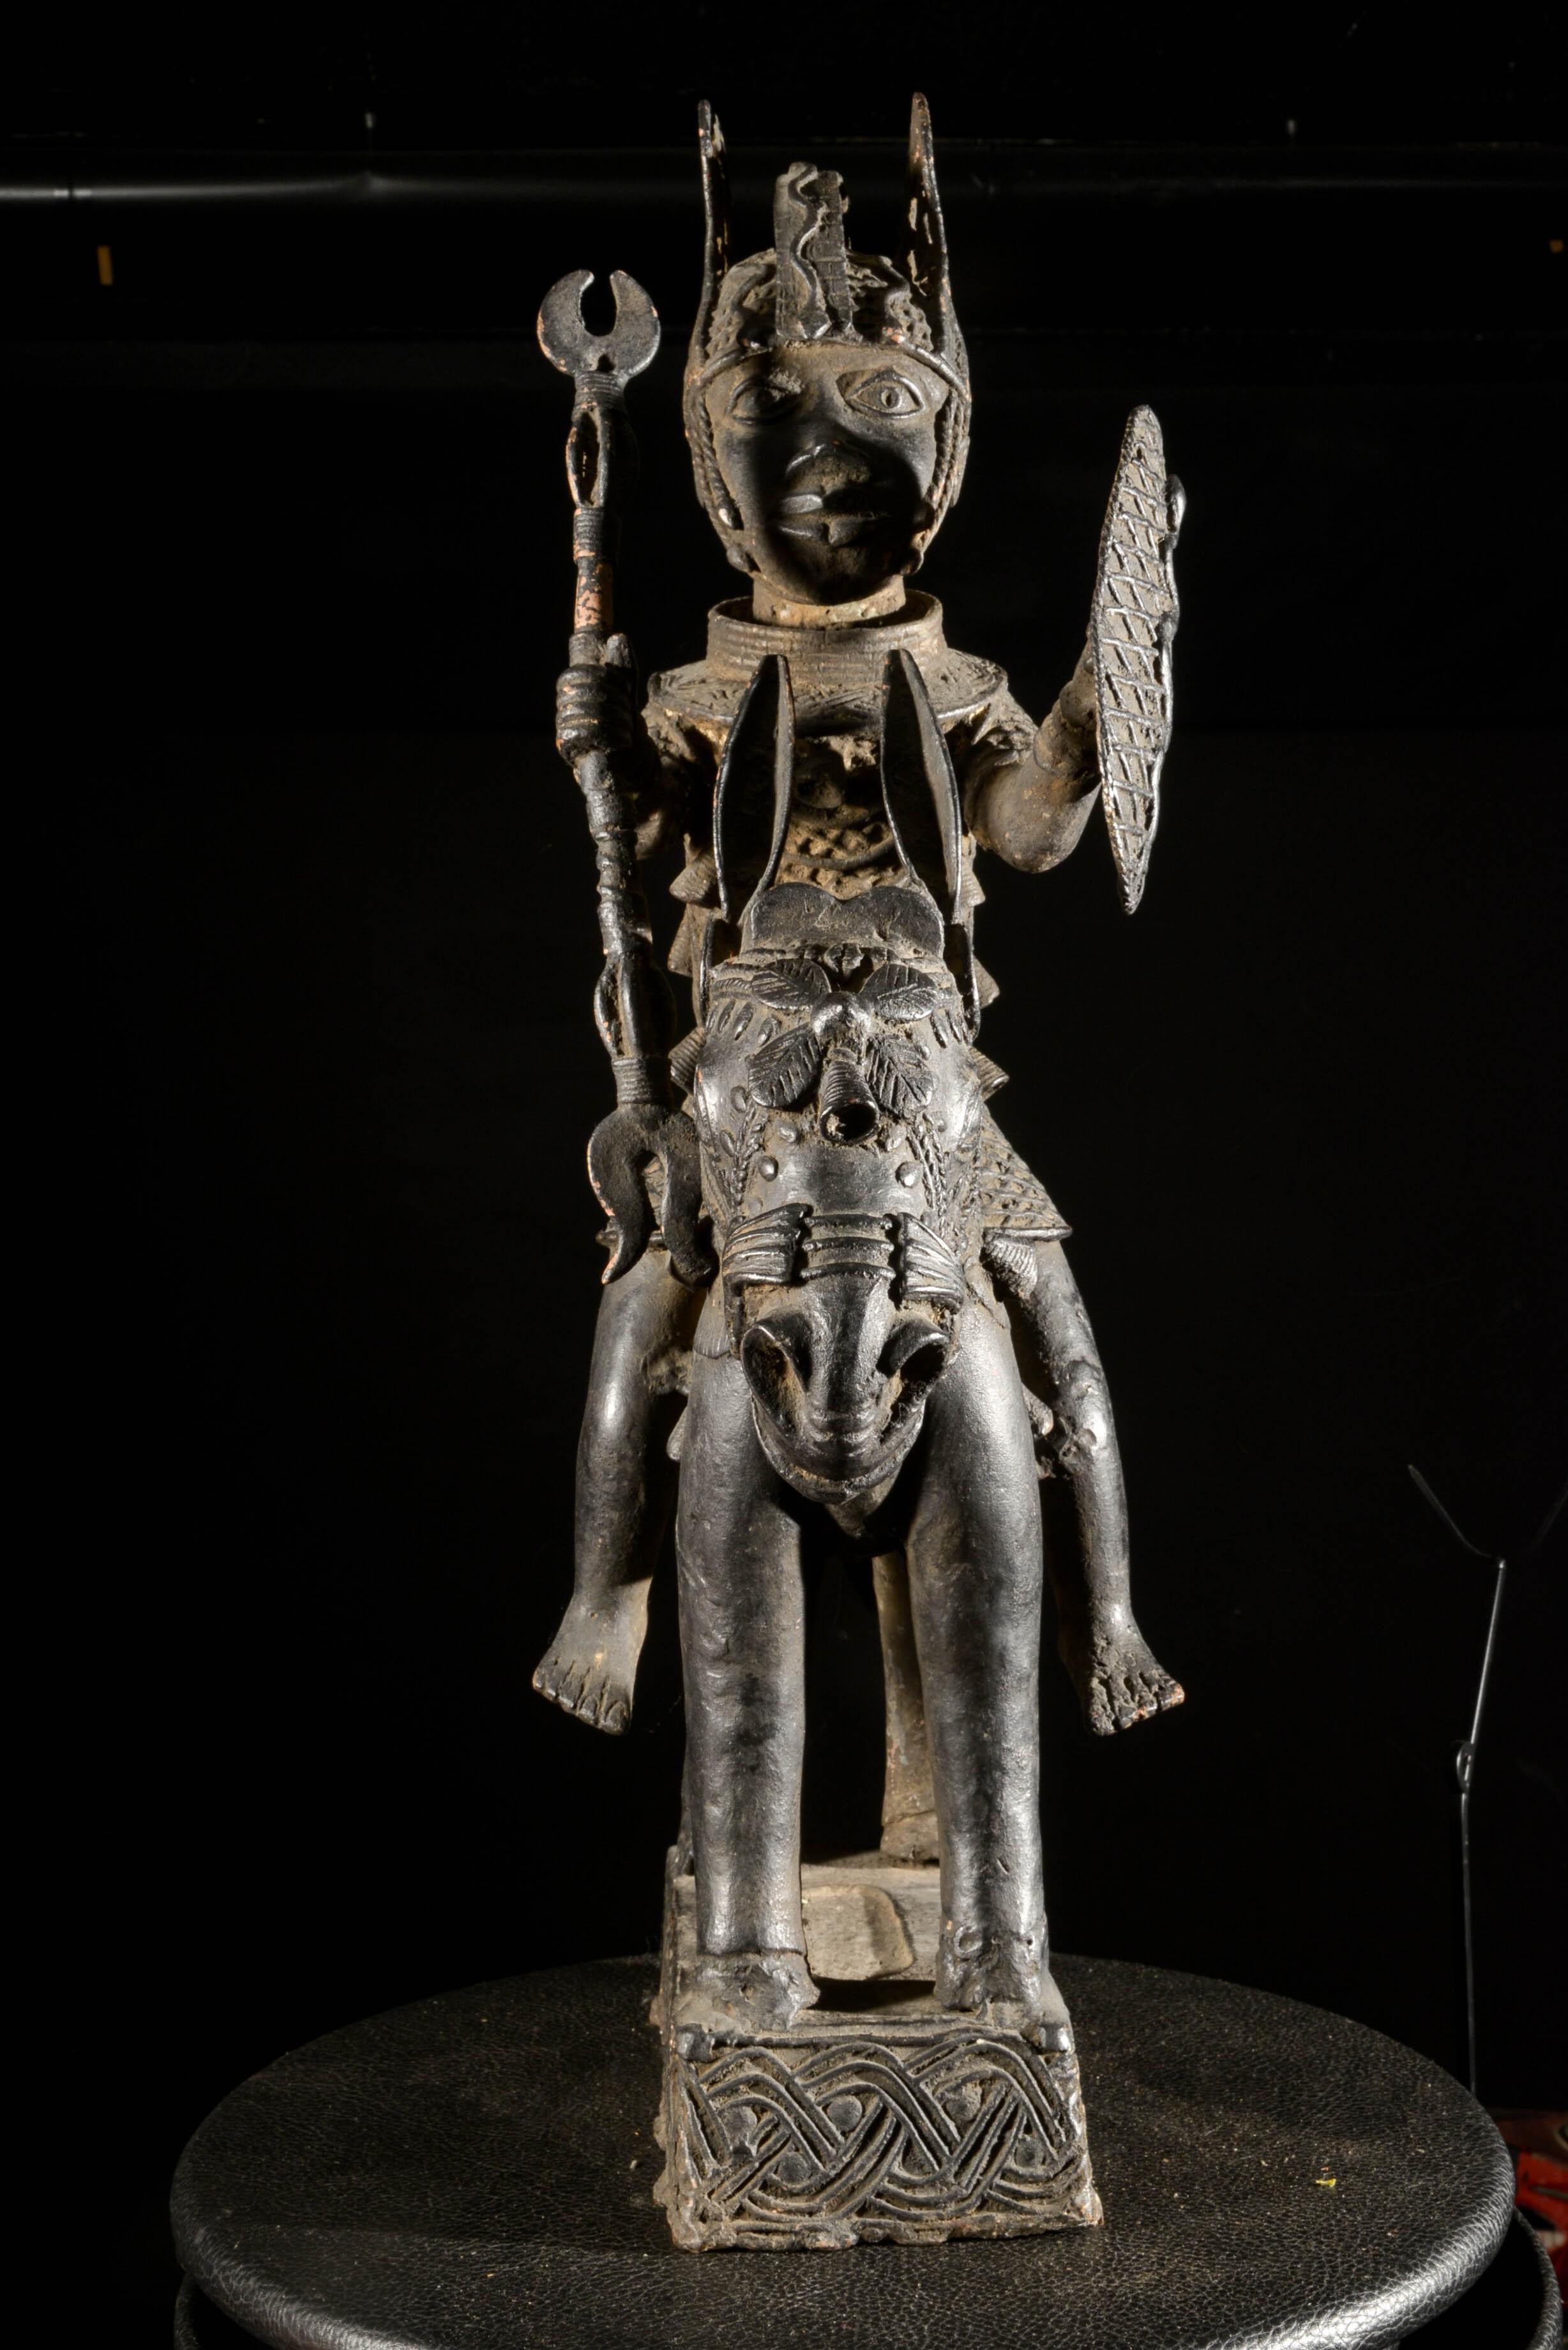 Cavalier en alliage bronzier - Nigeria - BIni Edo - Bronze cire perdue